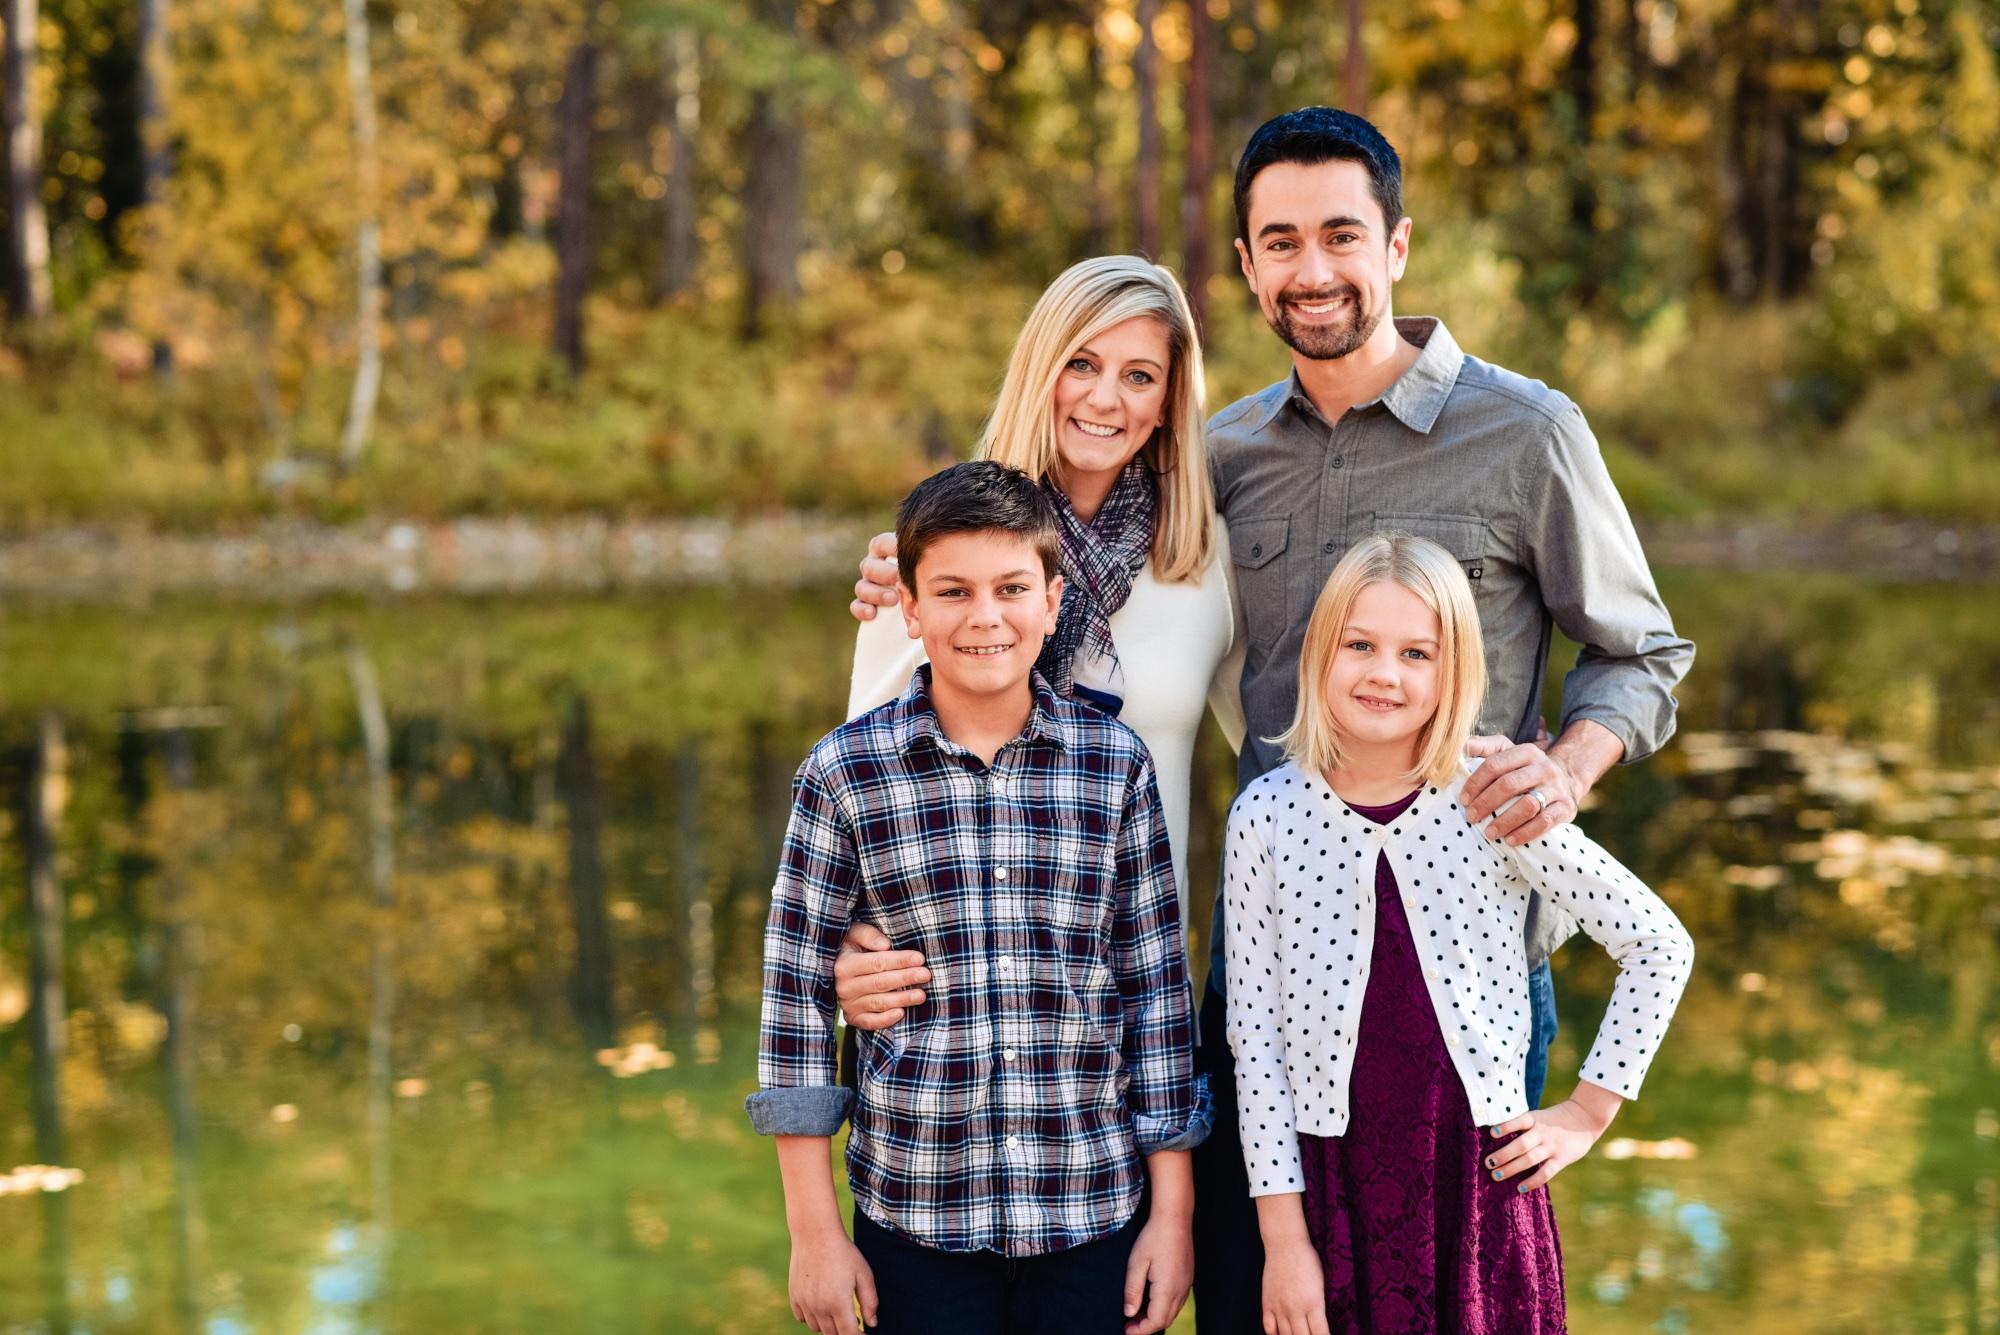 lindseyjane_family010.jpg